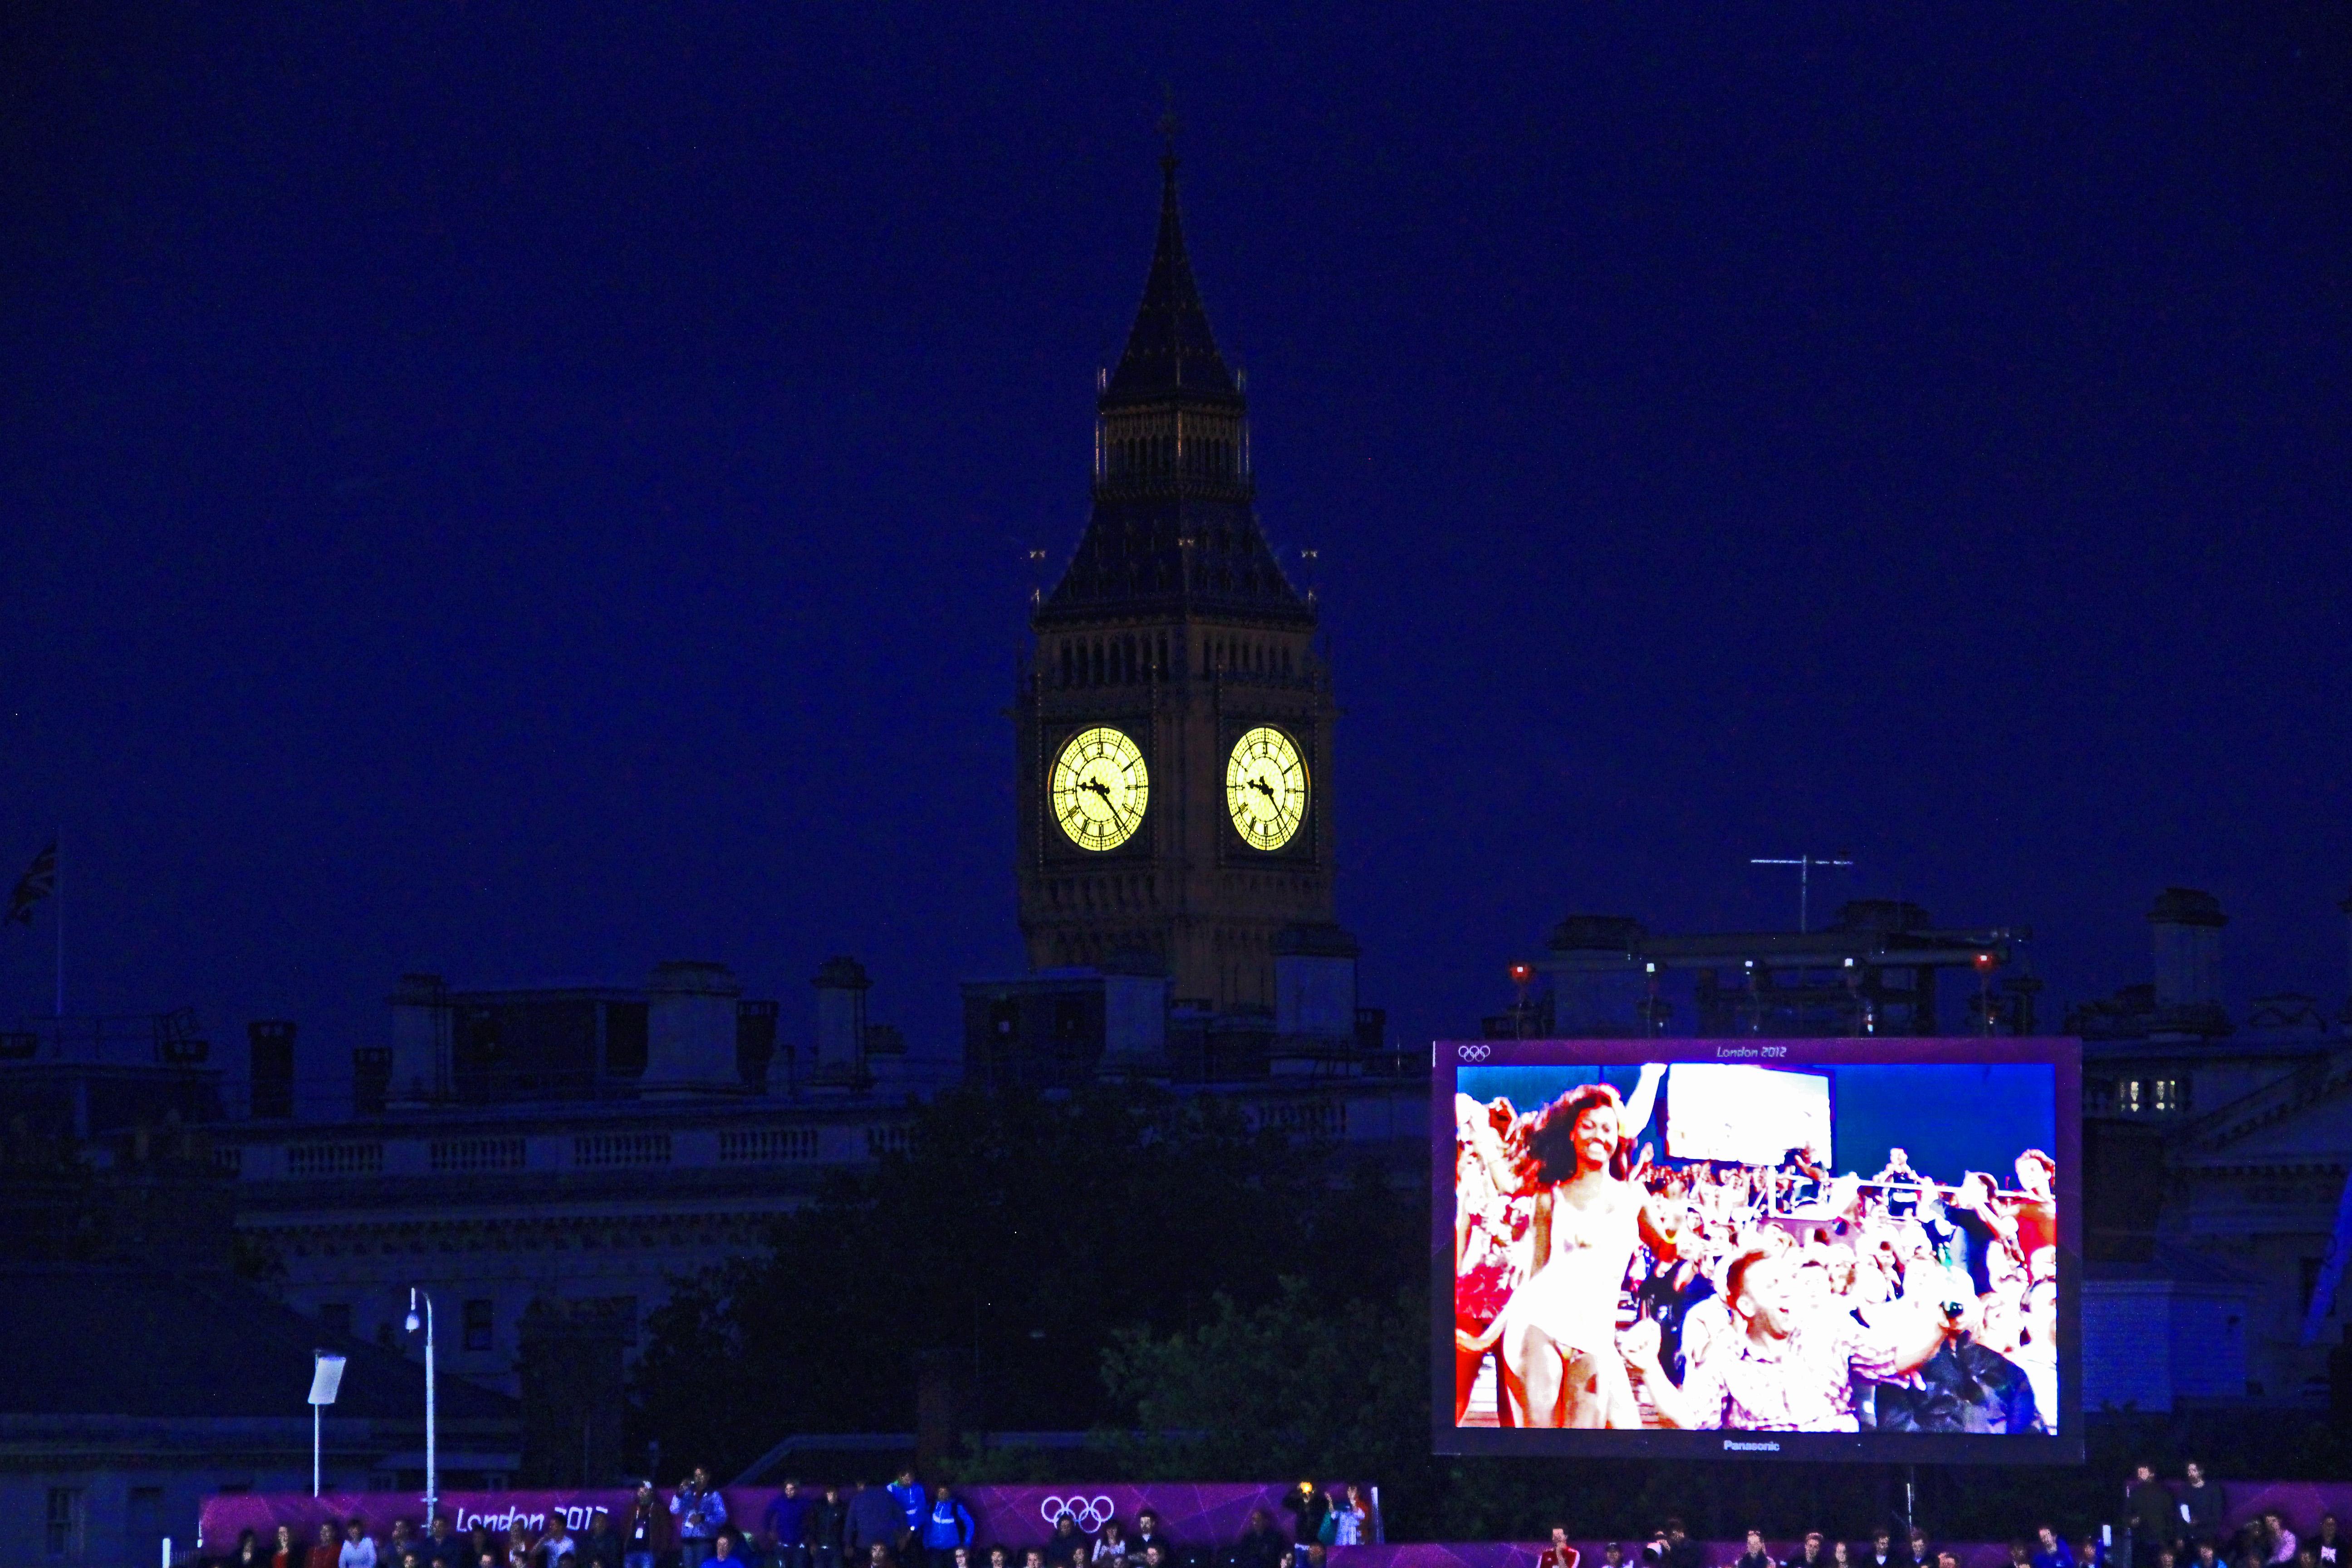 London 2012 - © JonoVernon-Powell